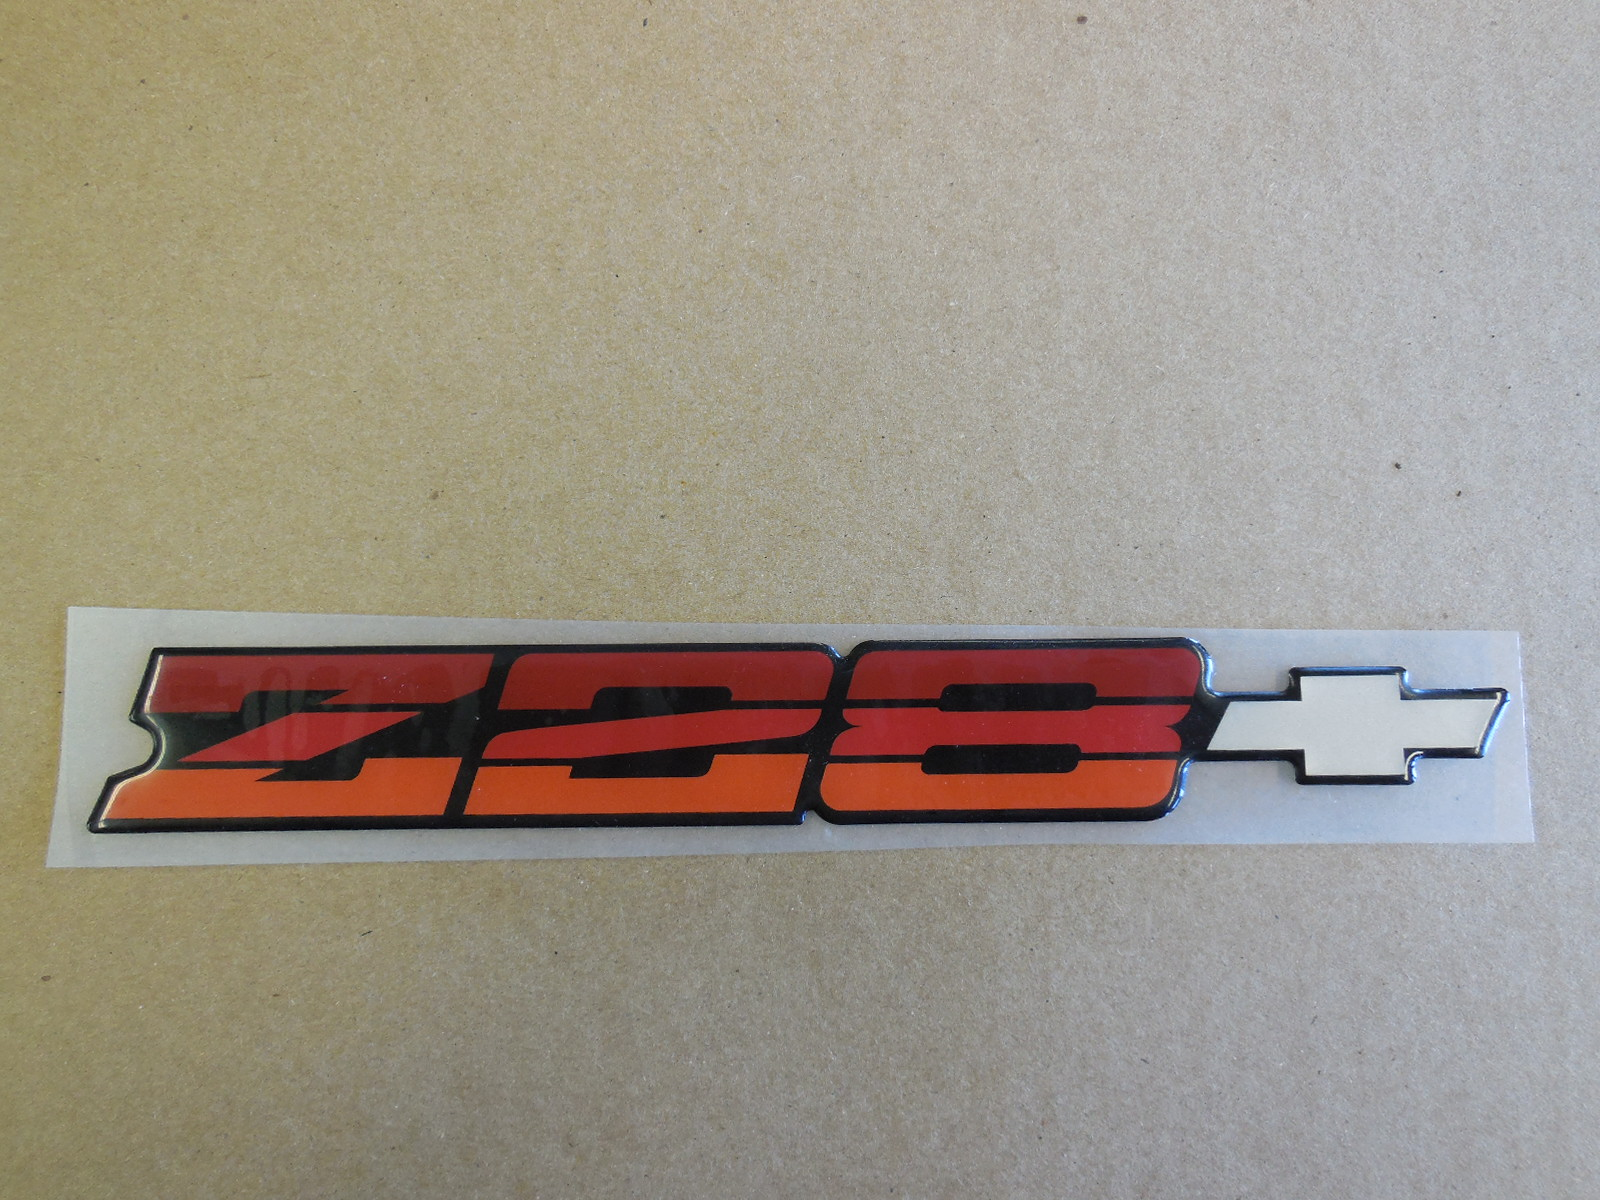 NOS GM 1985-1990 Camaro Z28 Rear Bumper Emblem | GM Sports